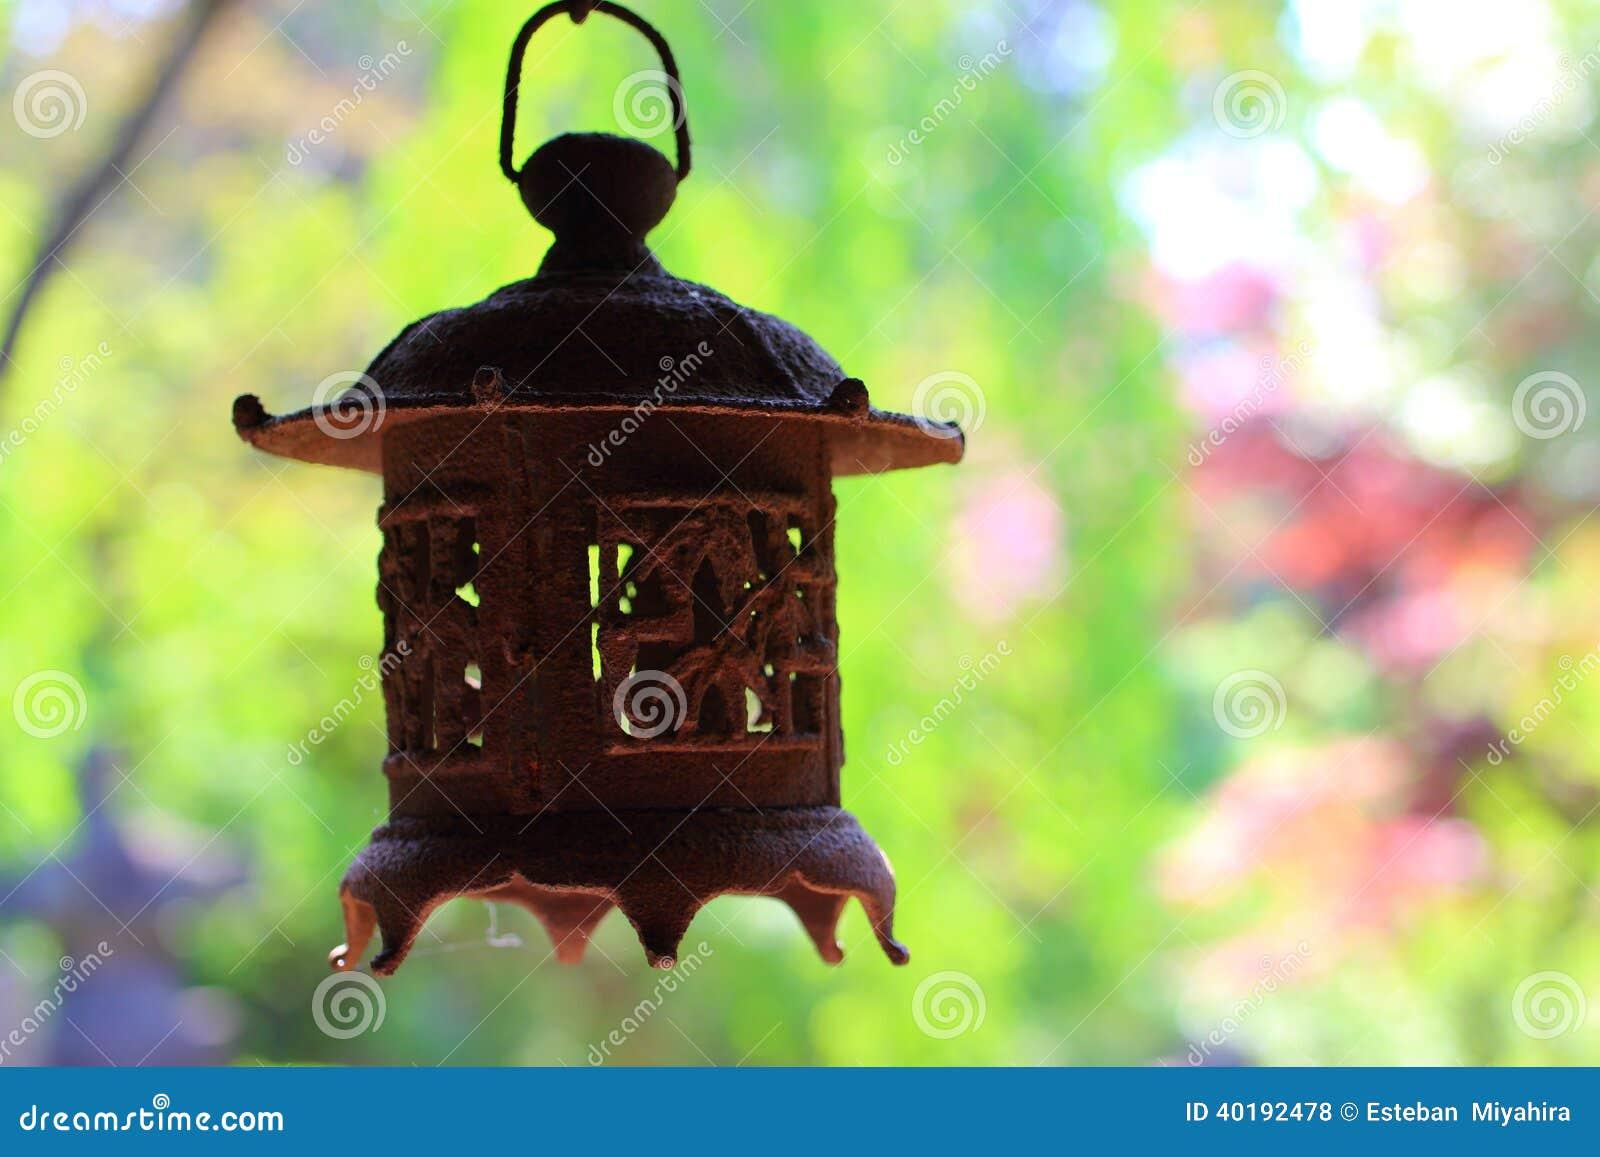 vieille lanterne japonaise photo stock image 40192478. Black Bedroom Furniture Sets. Home Design Ideas